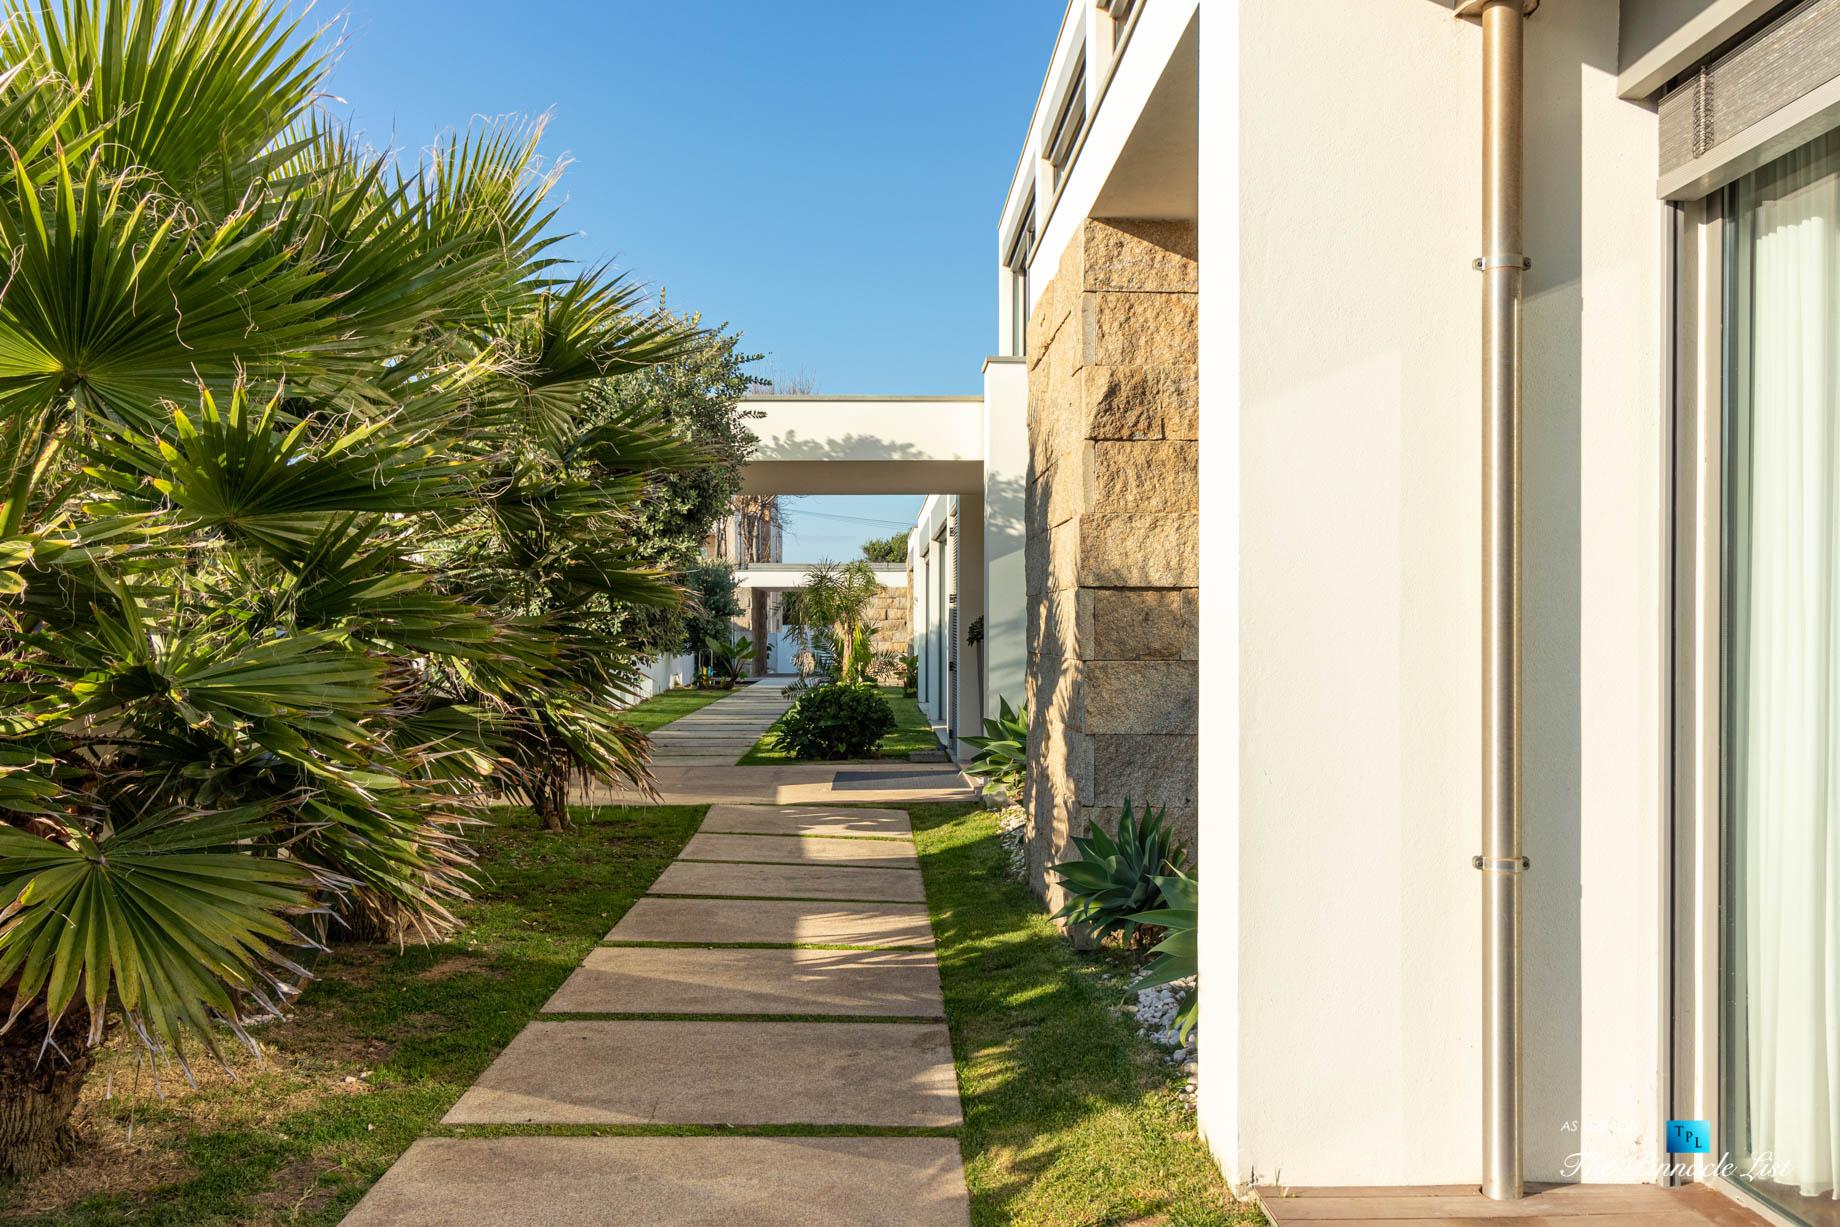 Francelos Beach Luxury T5 Villa - Porto, Portugal - Exterior Walkway - Luxury Real Estate – Modern Home